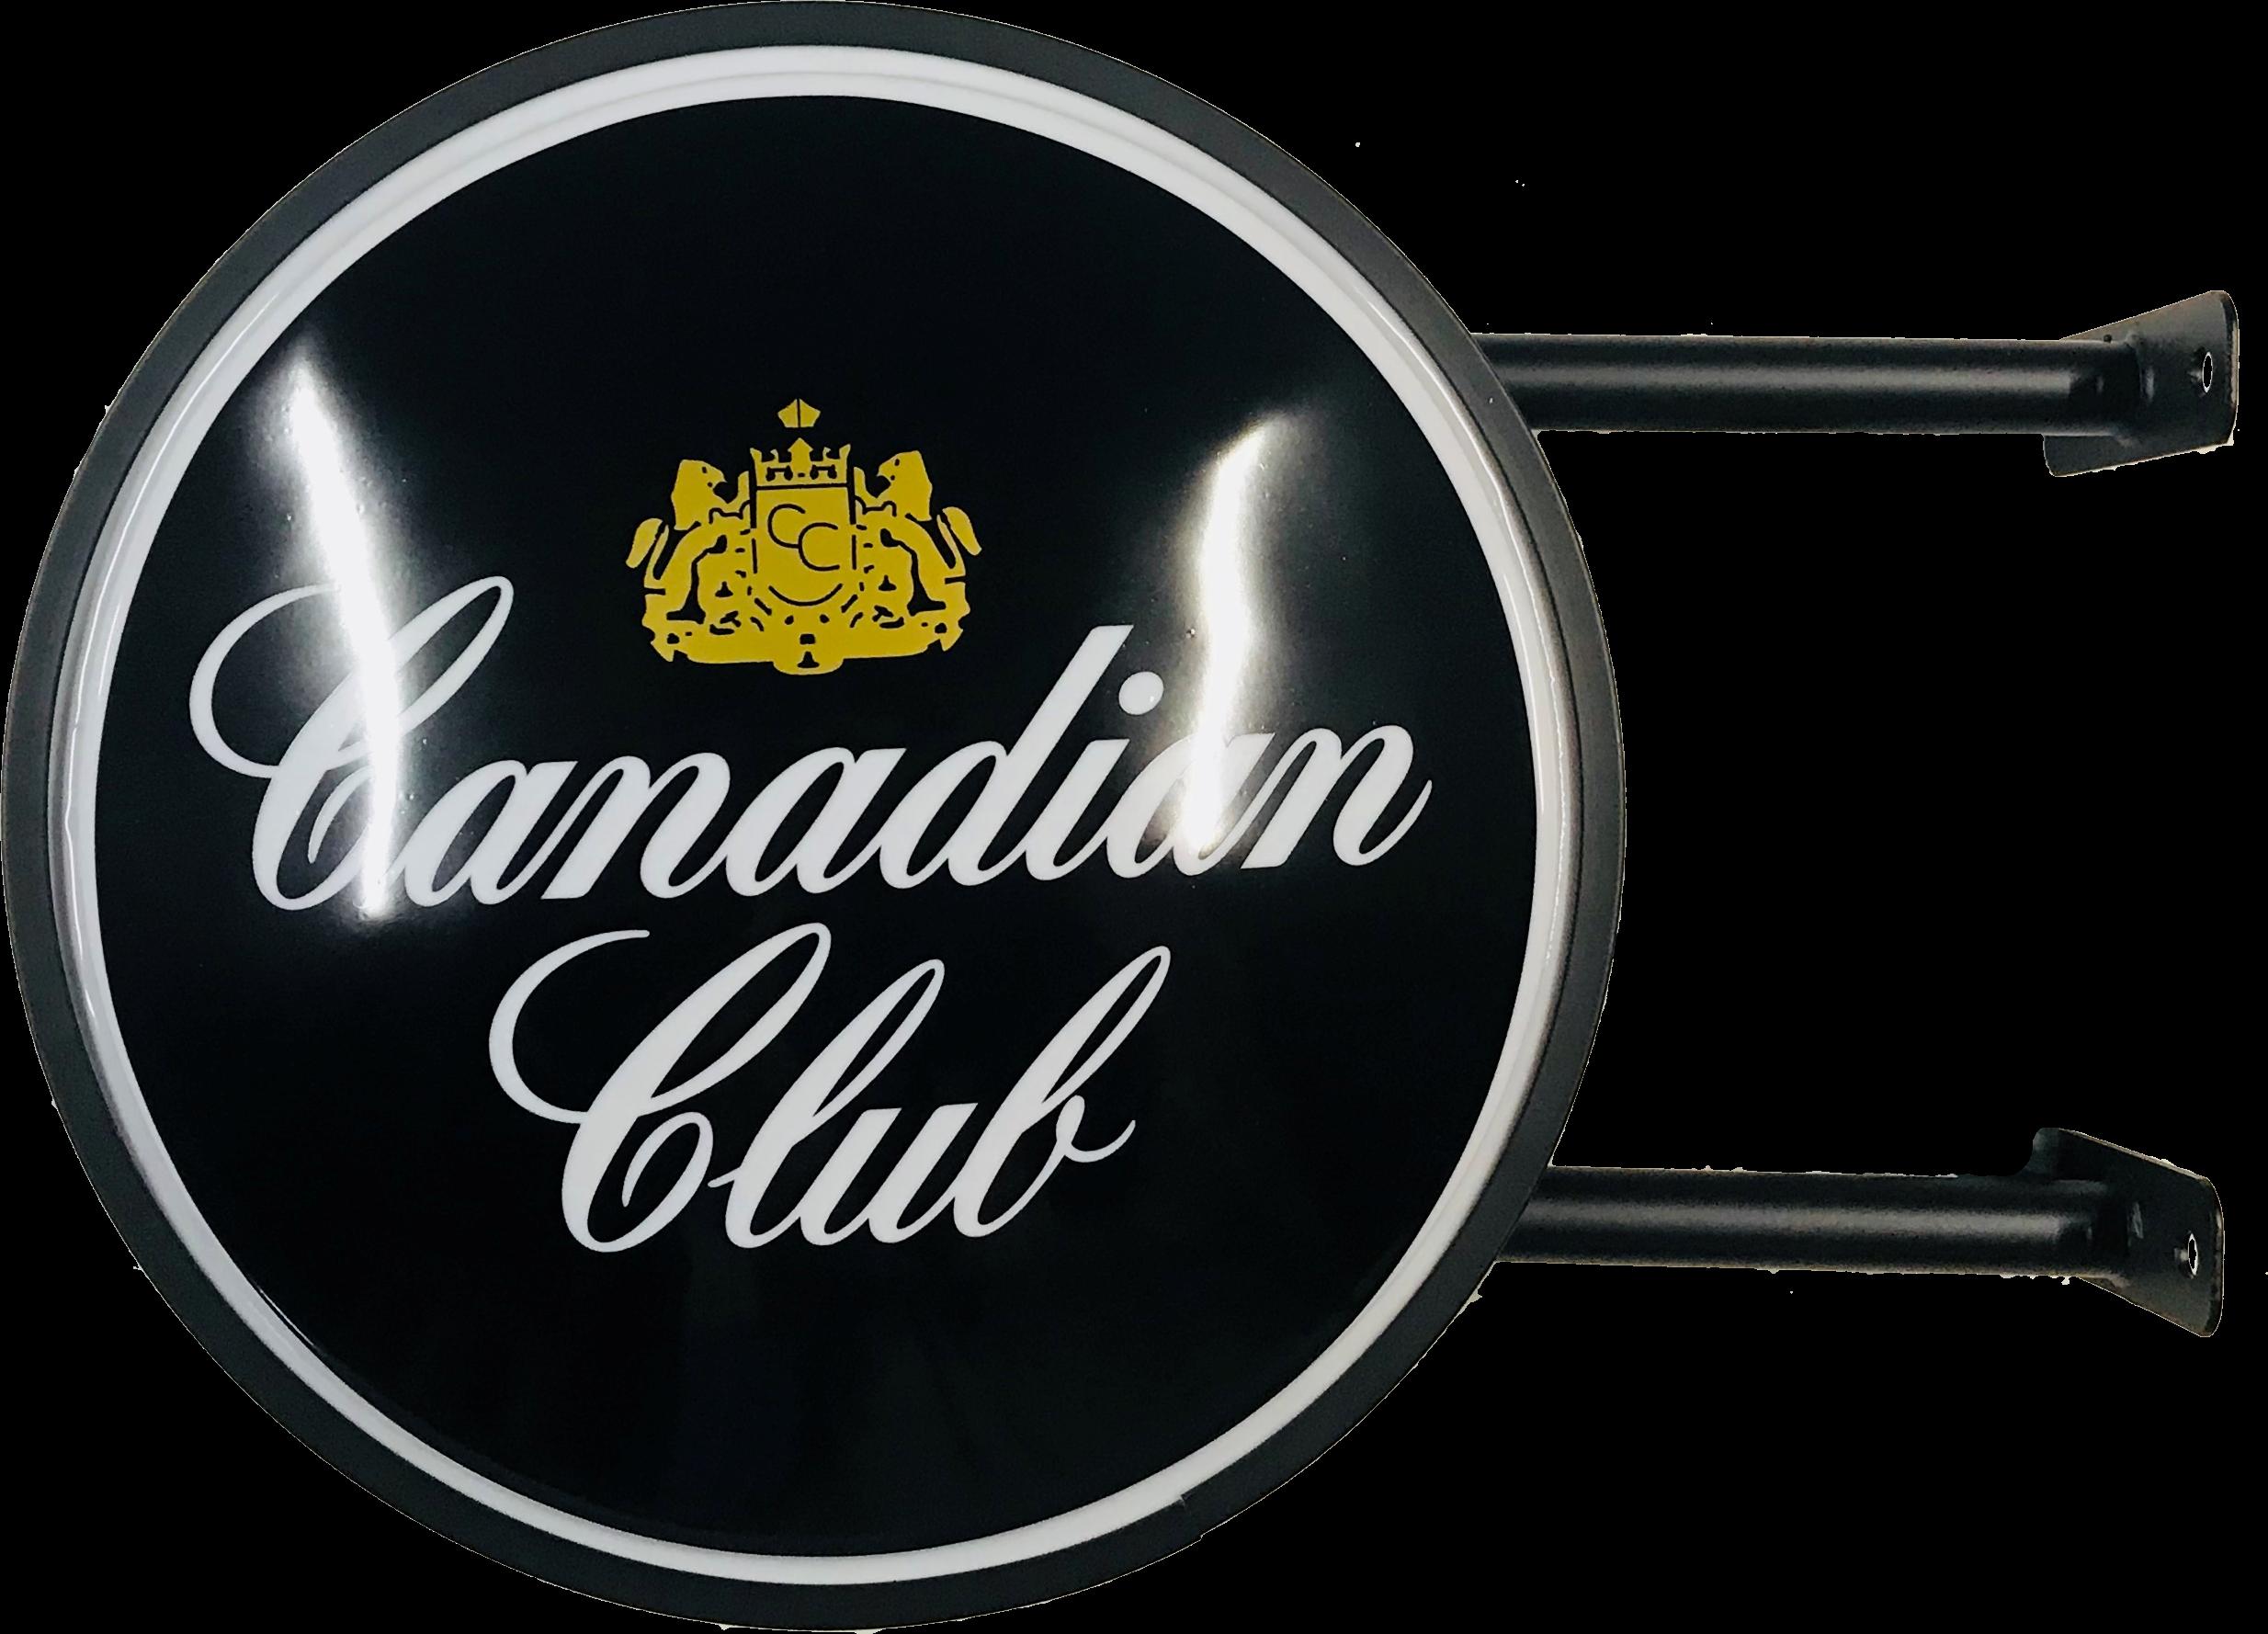 Canadian Club Spirits Bar Lighting Wall Sign Light LED